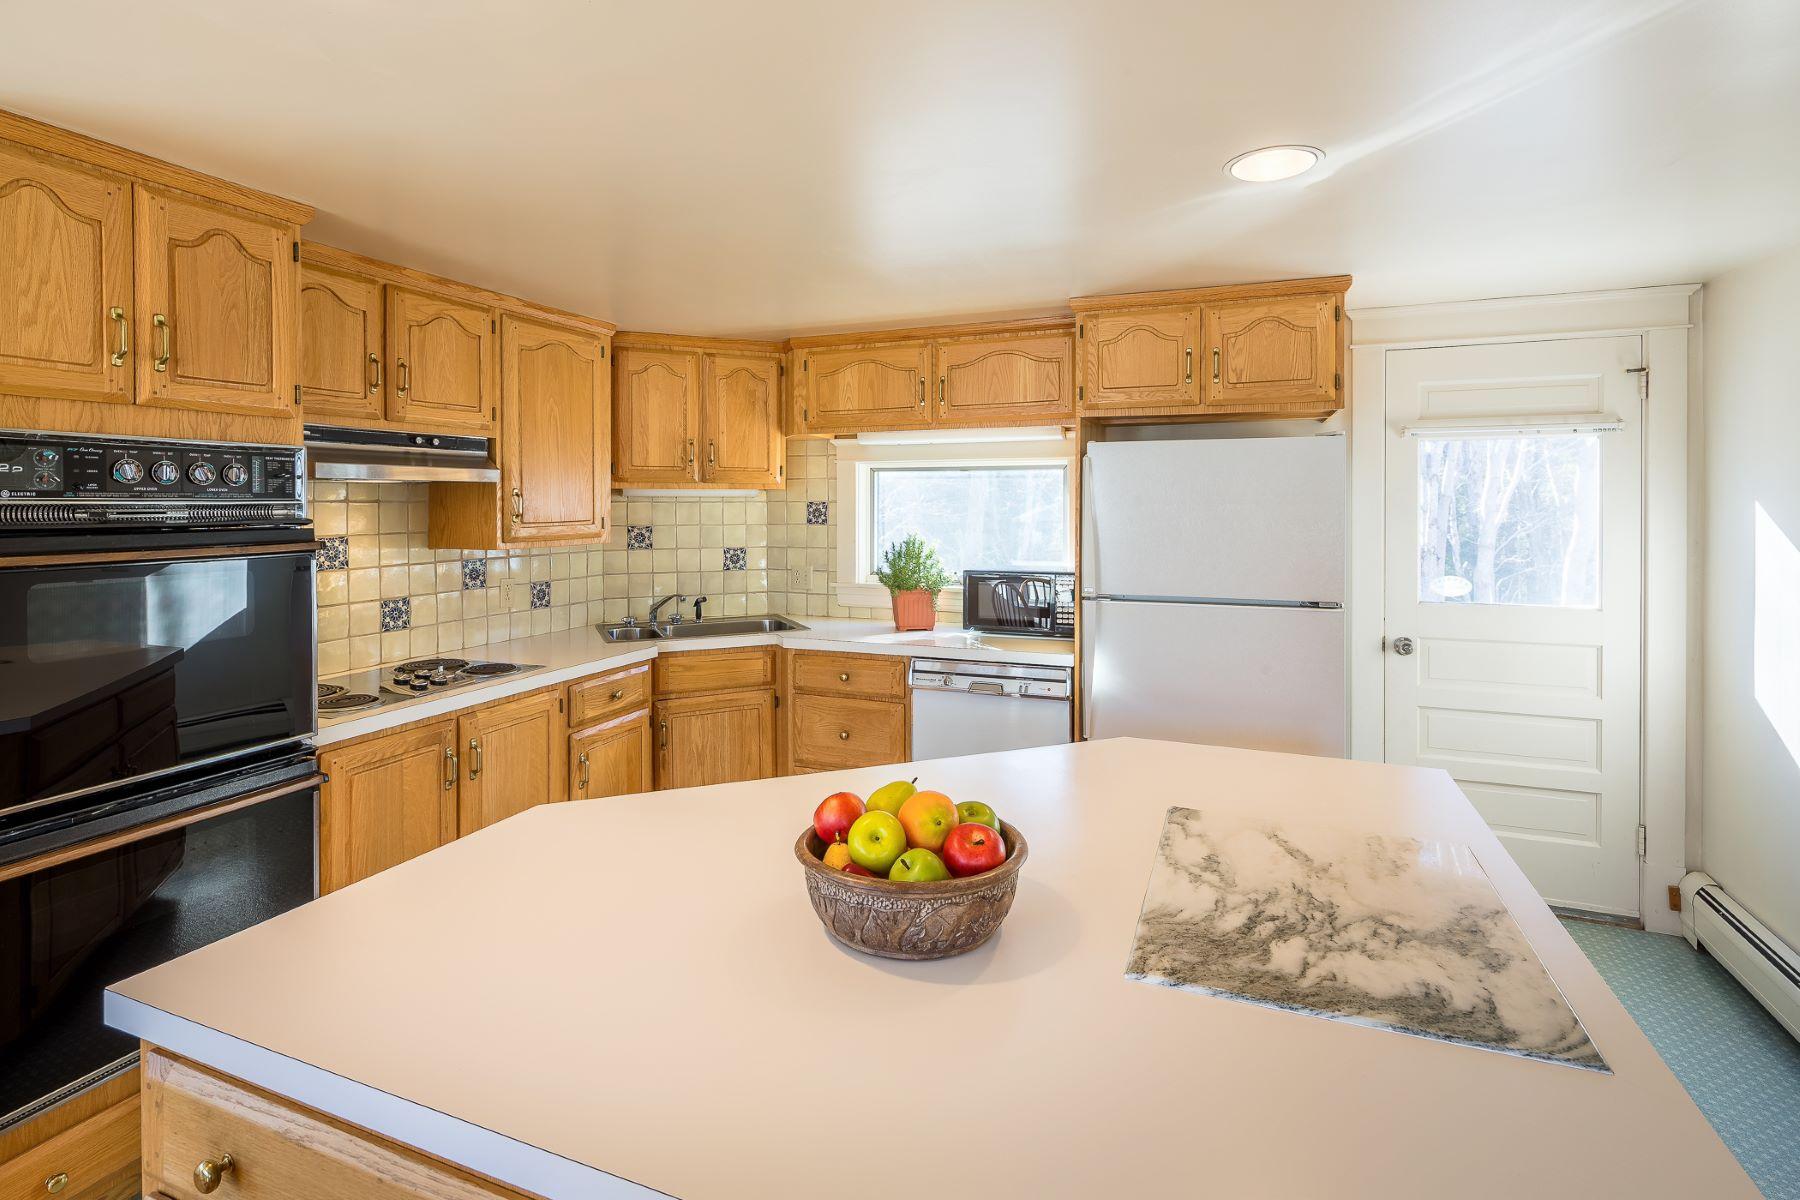 Additional photo for property listing at 40 Jordan Pond Road 40 Jordan Pond Road Seal Harbor, Maine 04675 United States